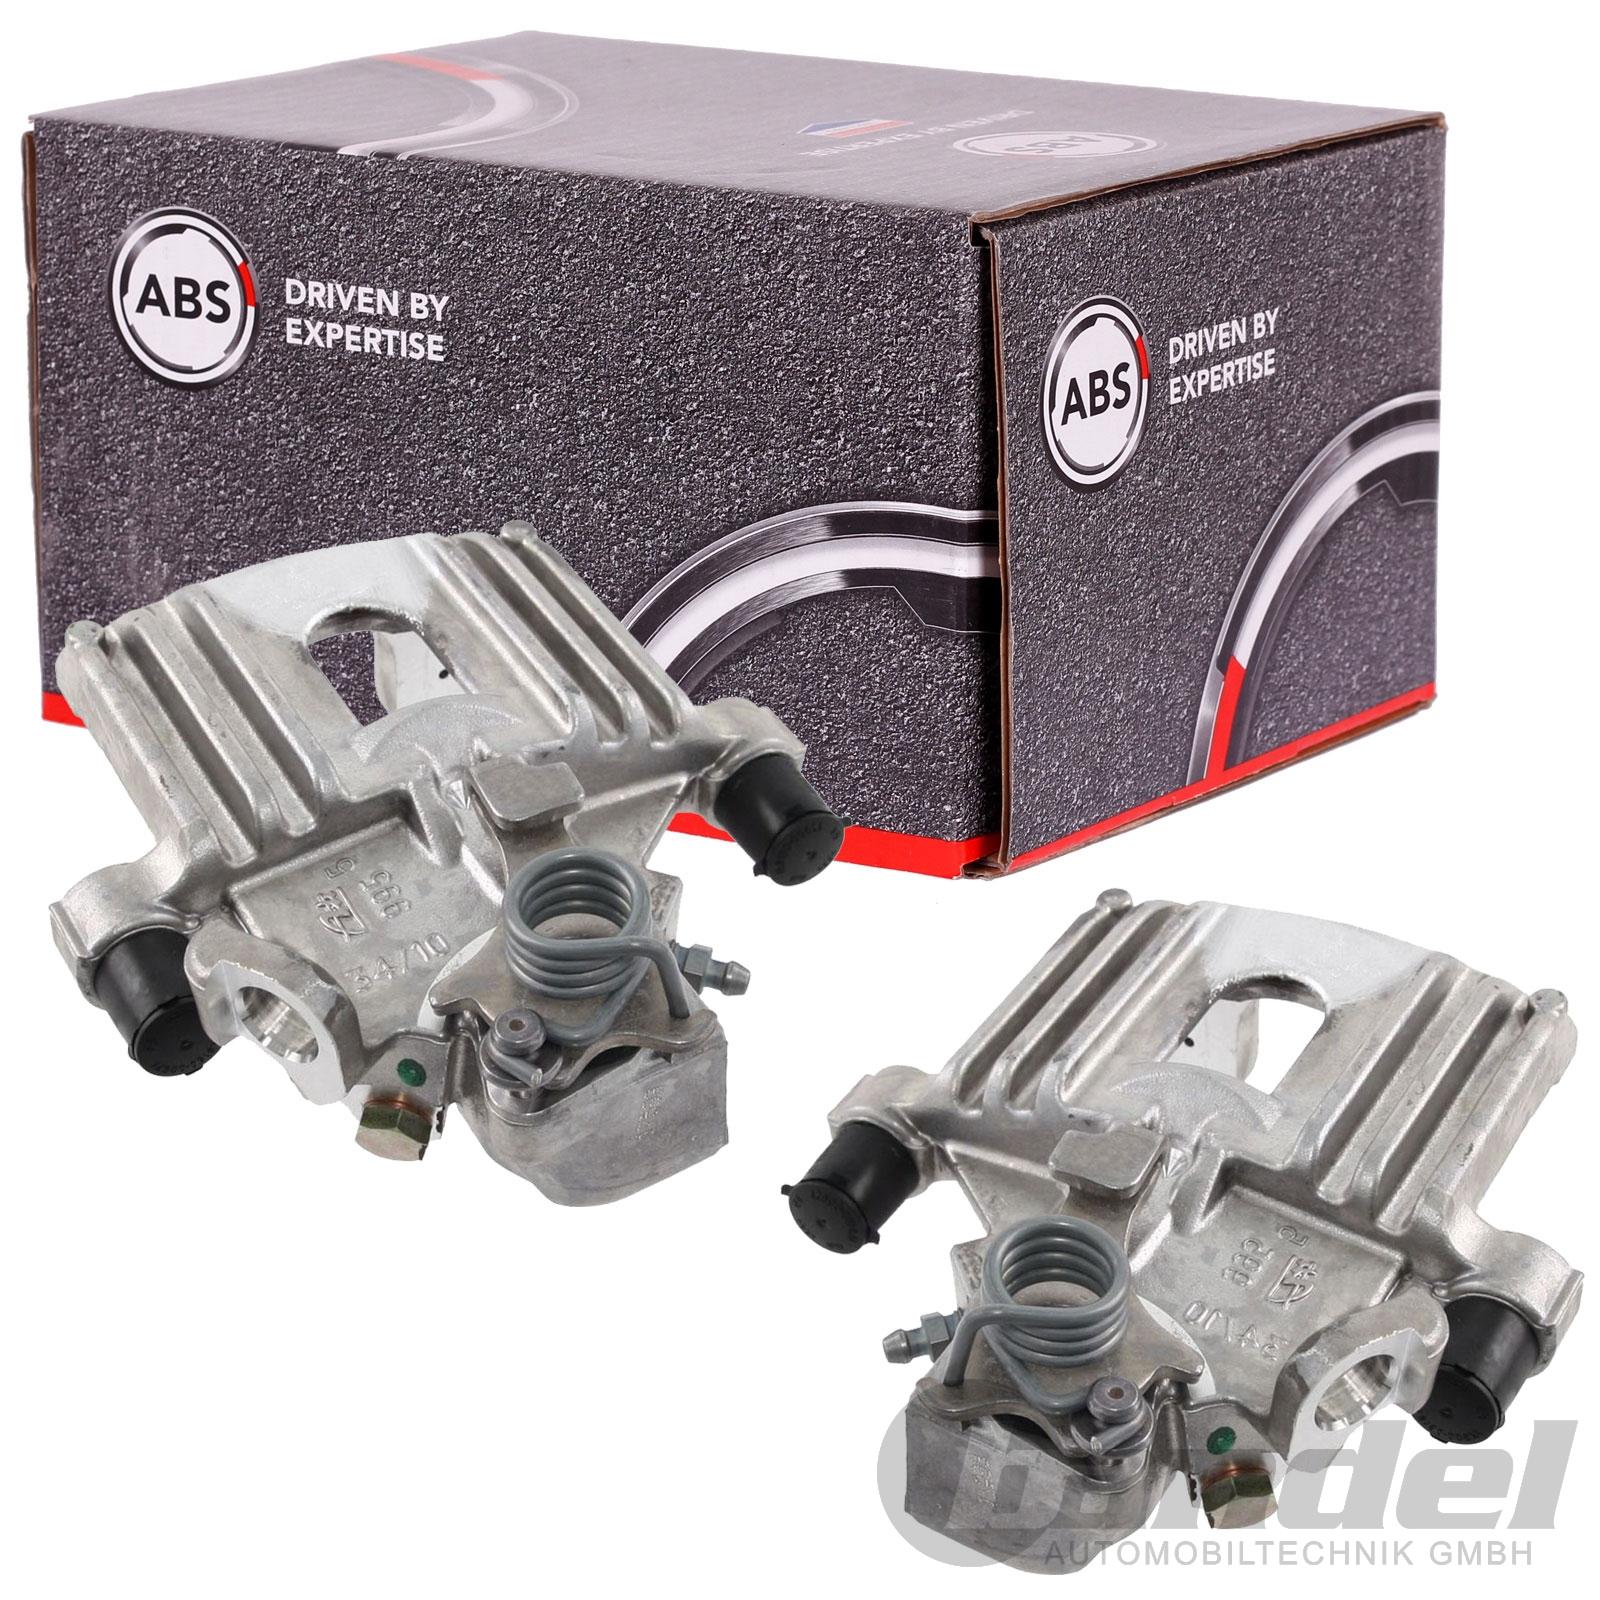 R52 2x BREMSSATTEL HINTEN LINKS+RECHTS MINI R50,R53 MINI CABRIO